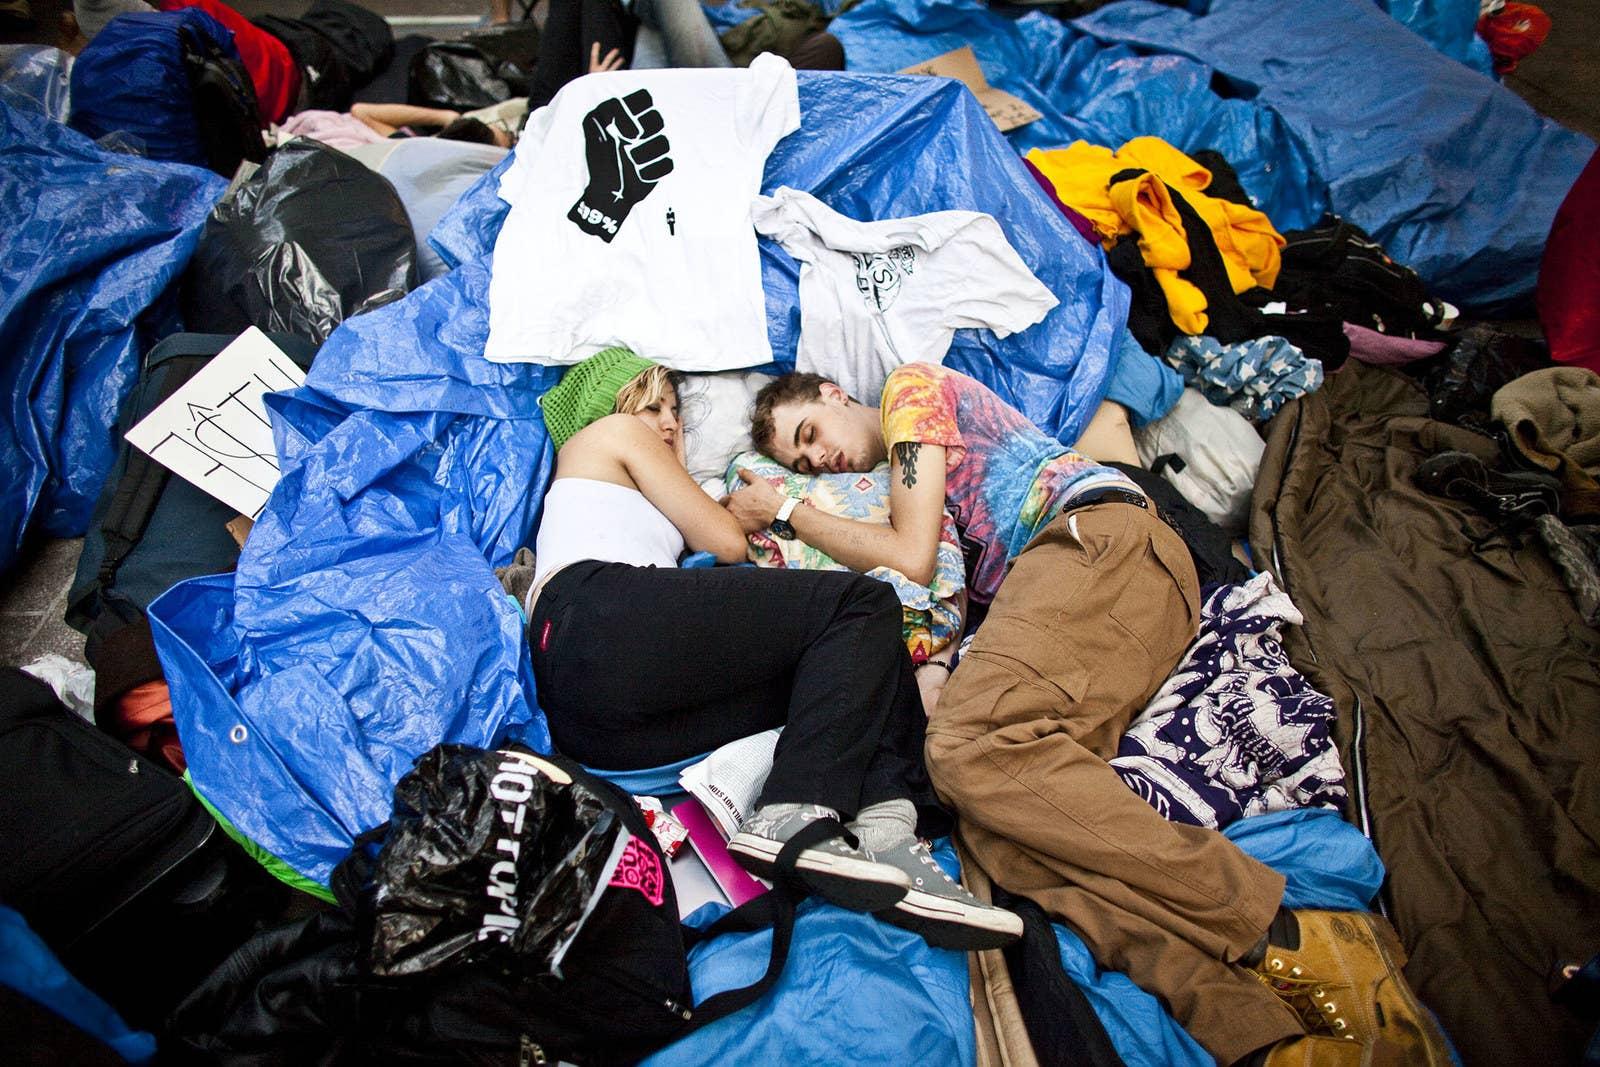 A couple sleeps at the Zuccotti Park encampment on Oct. 8, 2011.